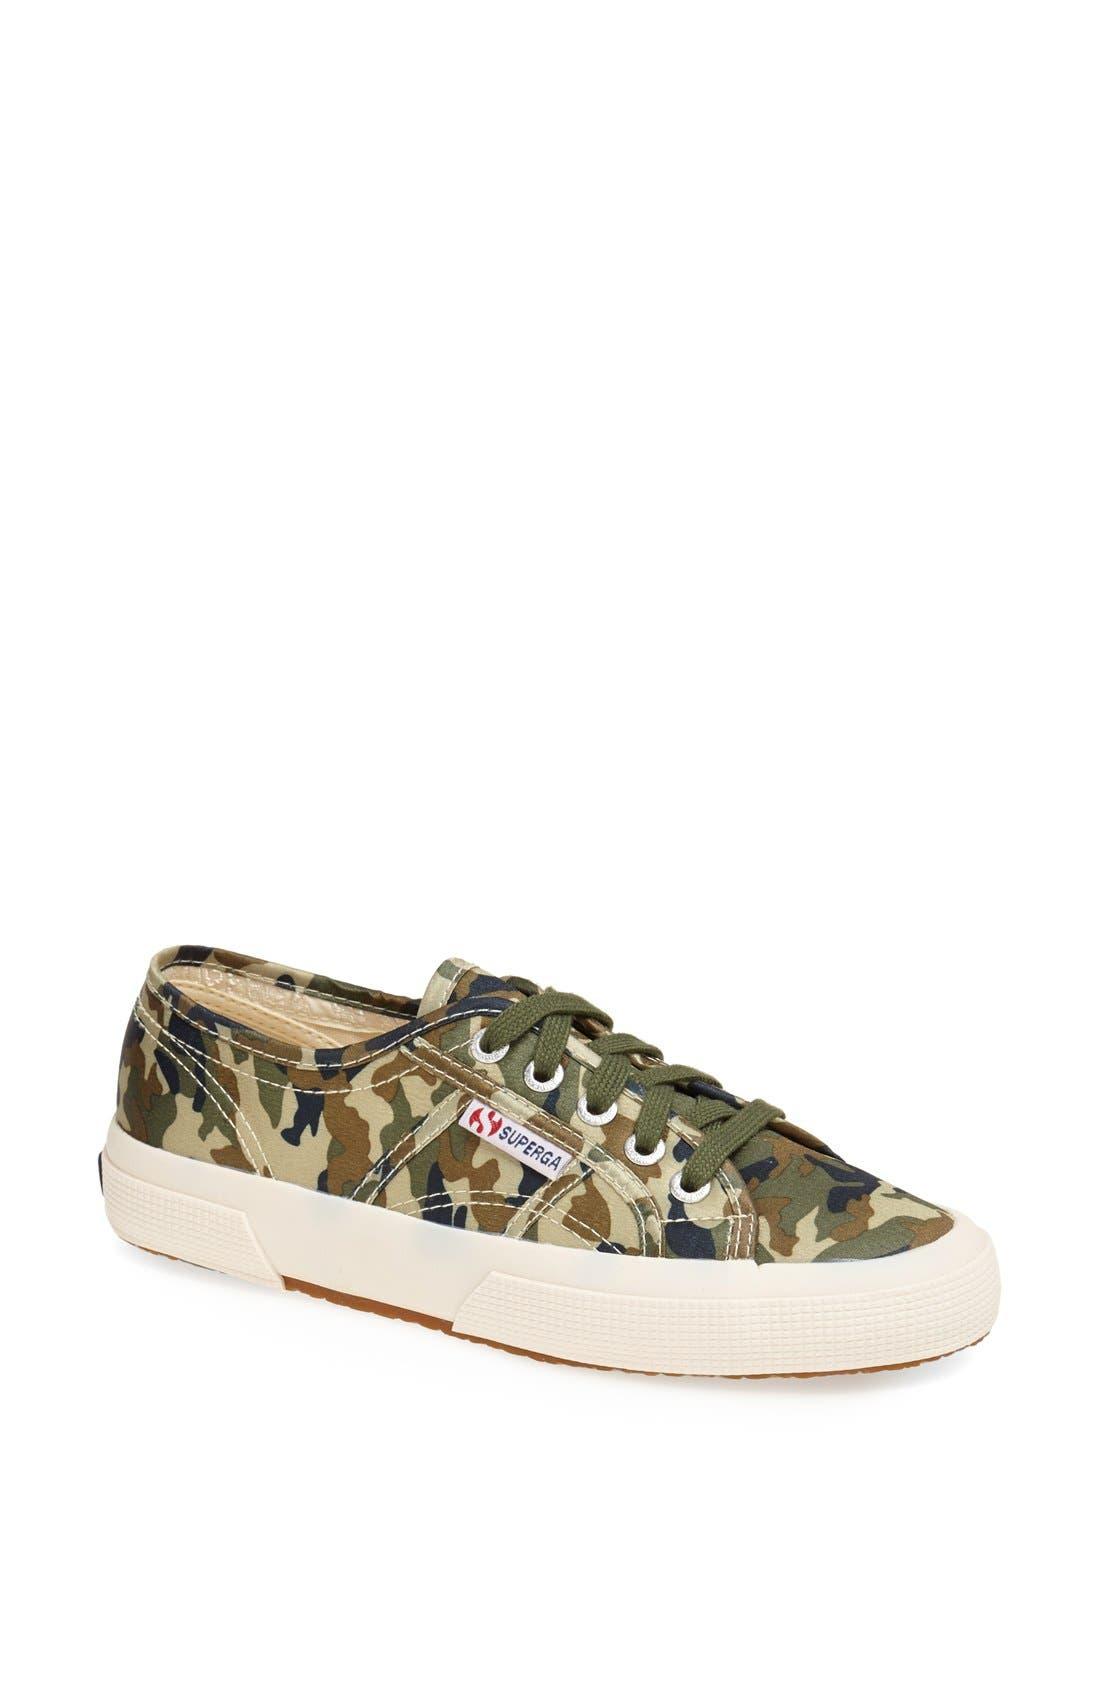 Superga 'Cotu - Camouflage' Sneaker